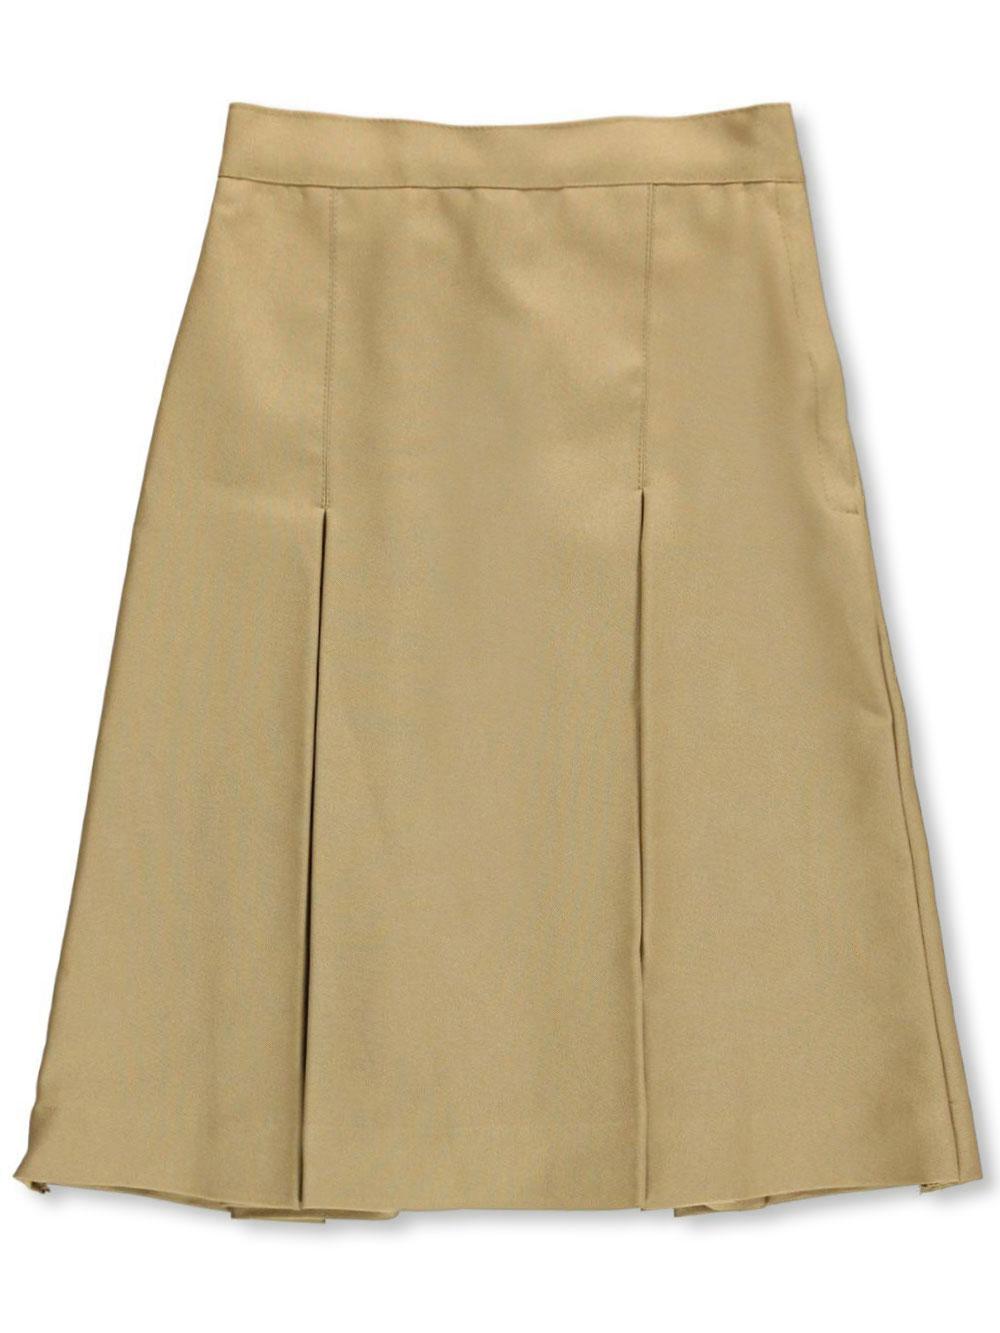 Image of Cookies Brand School Uniform Cookies Brand School Uniform Big Girls Junior Pleated Side Button Skirt  khaki junior 5